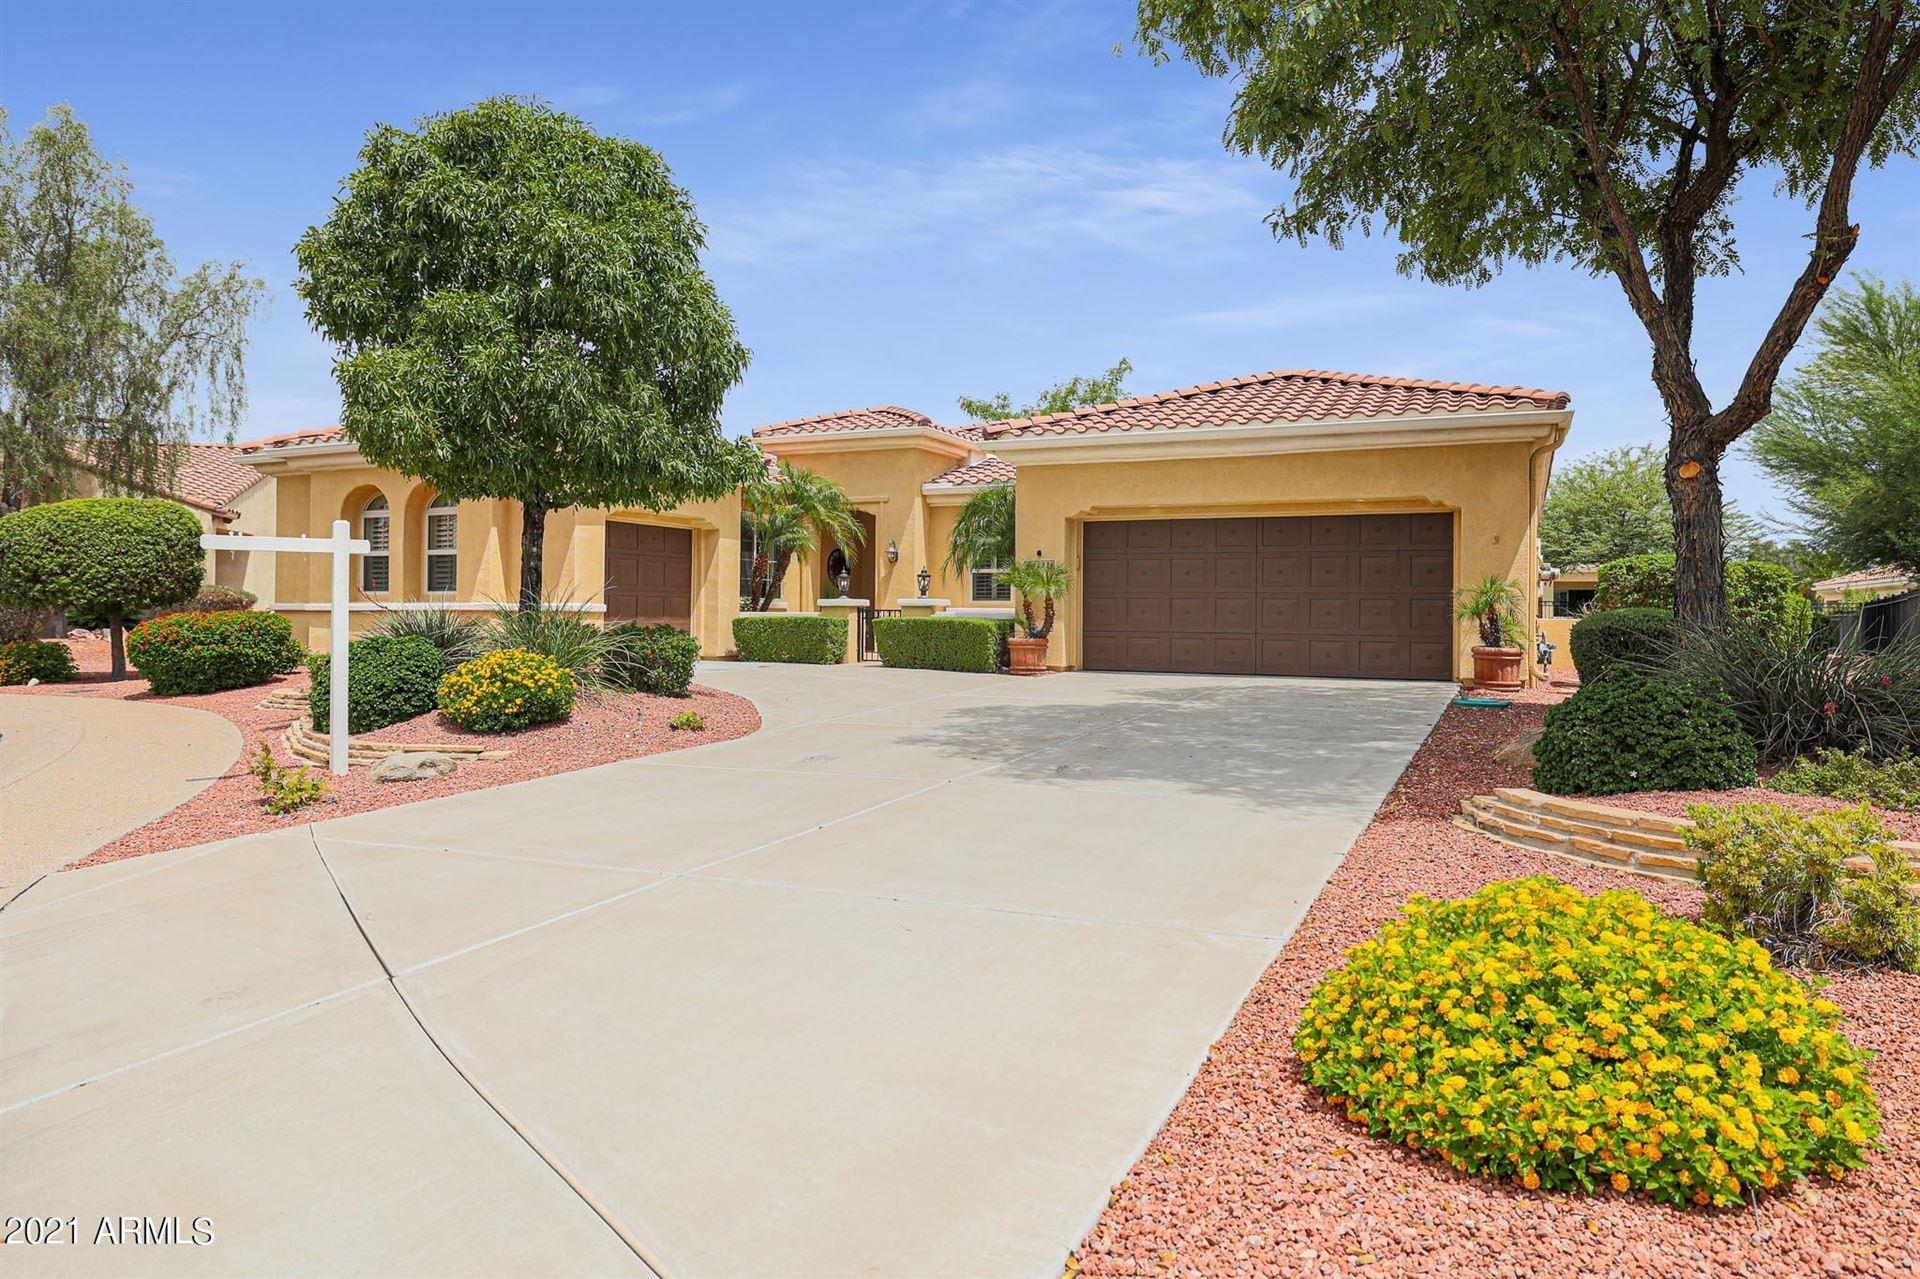 Photo of 12836 W CABRILLO Court, Sun City West, AZ 85375 (MLS # 6268067)